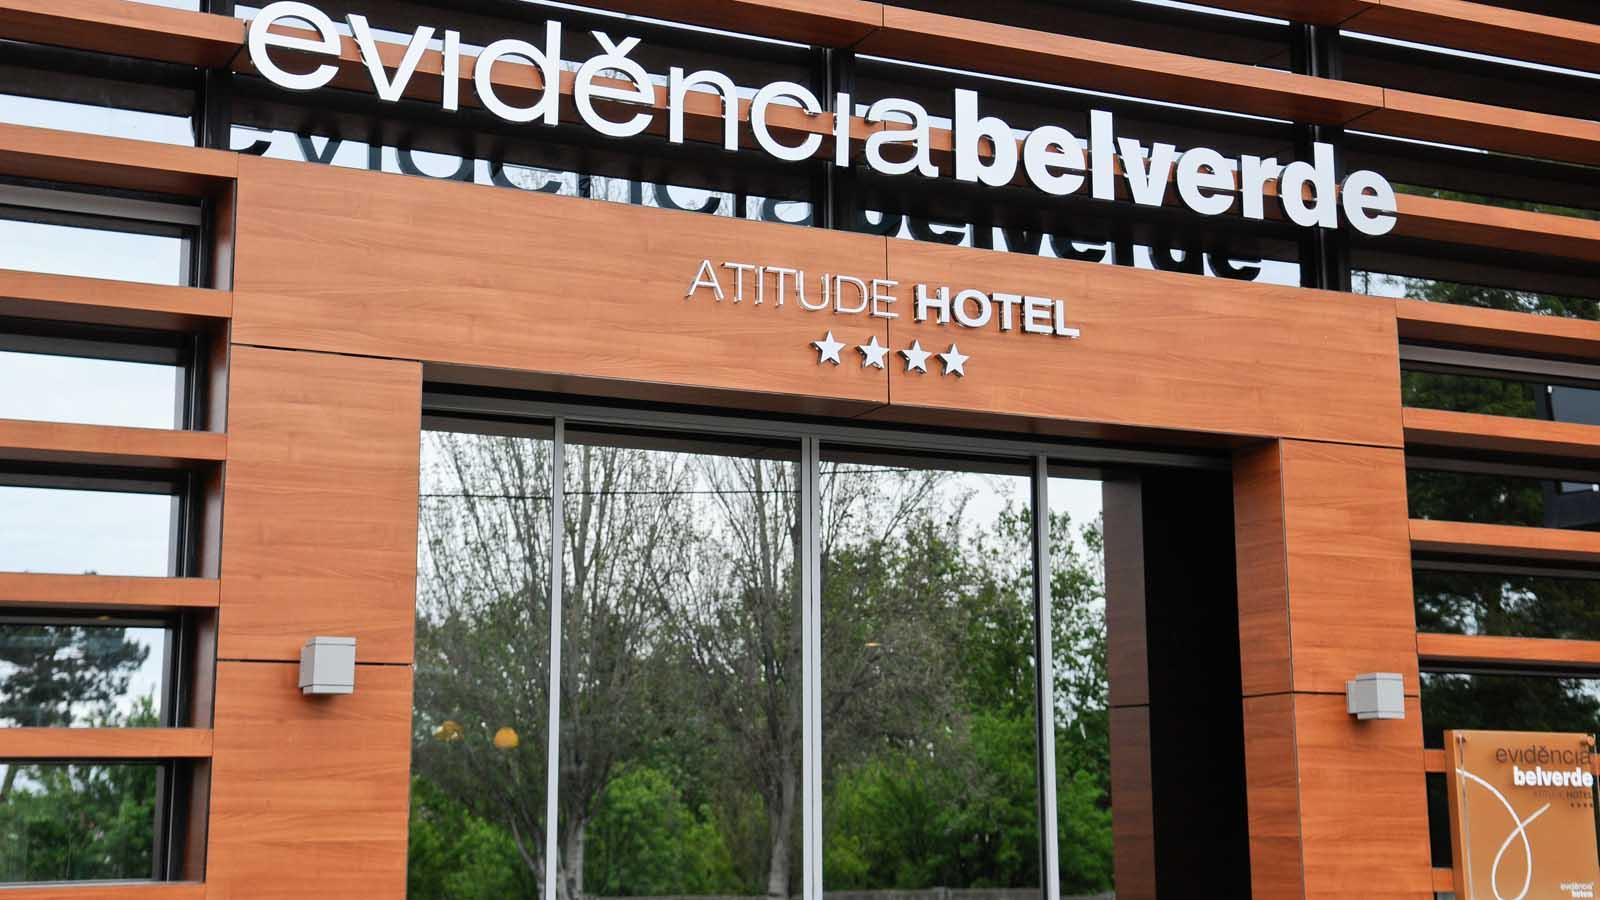 Evidencia Belverde Hotel